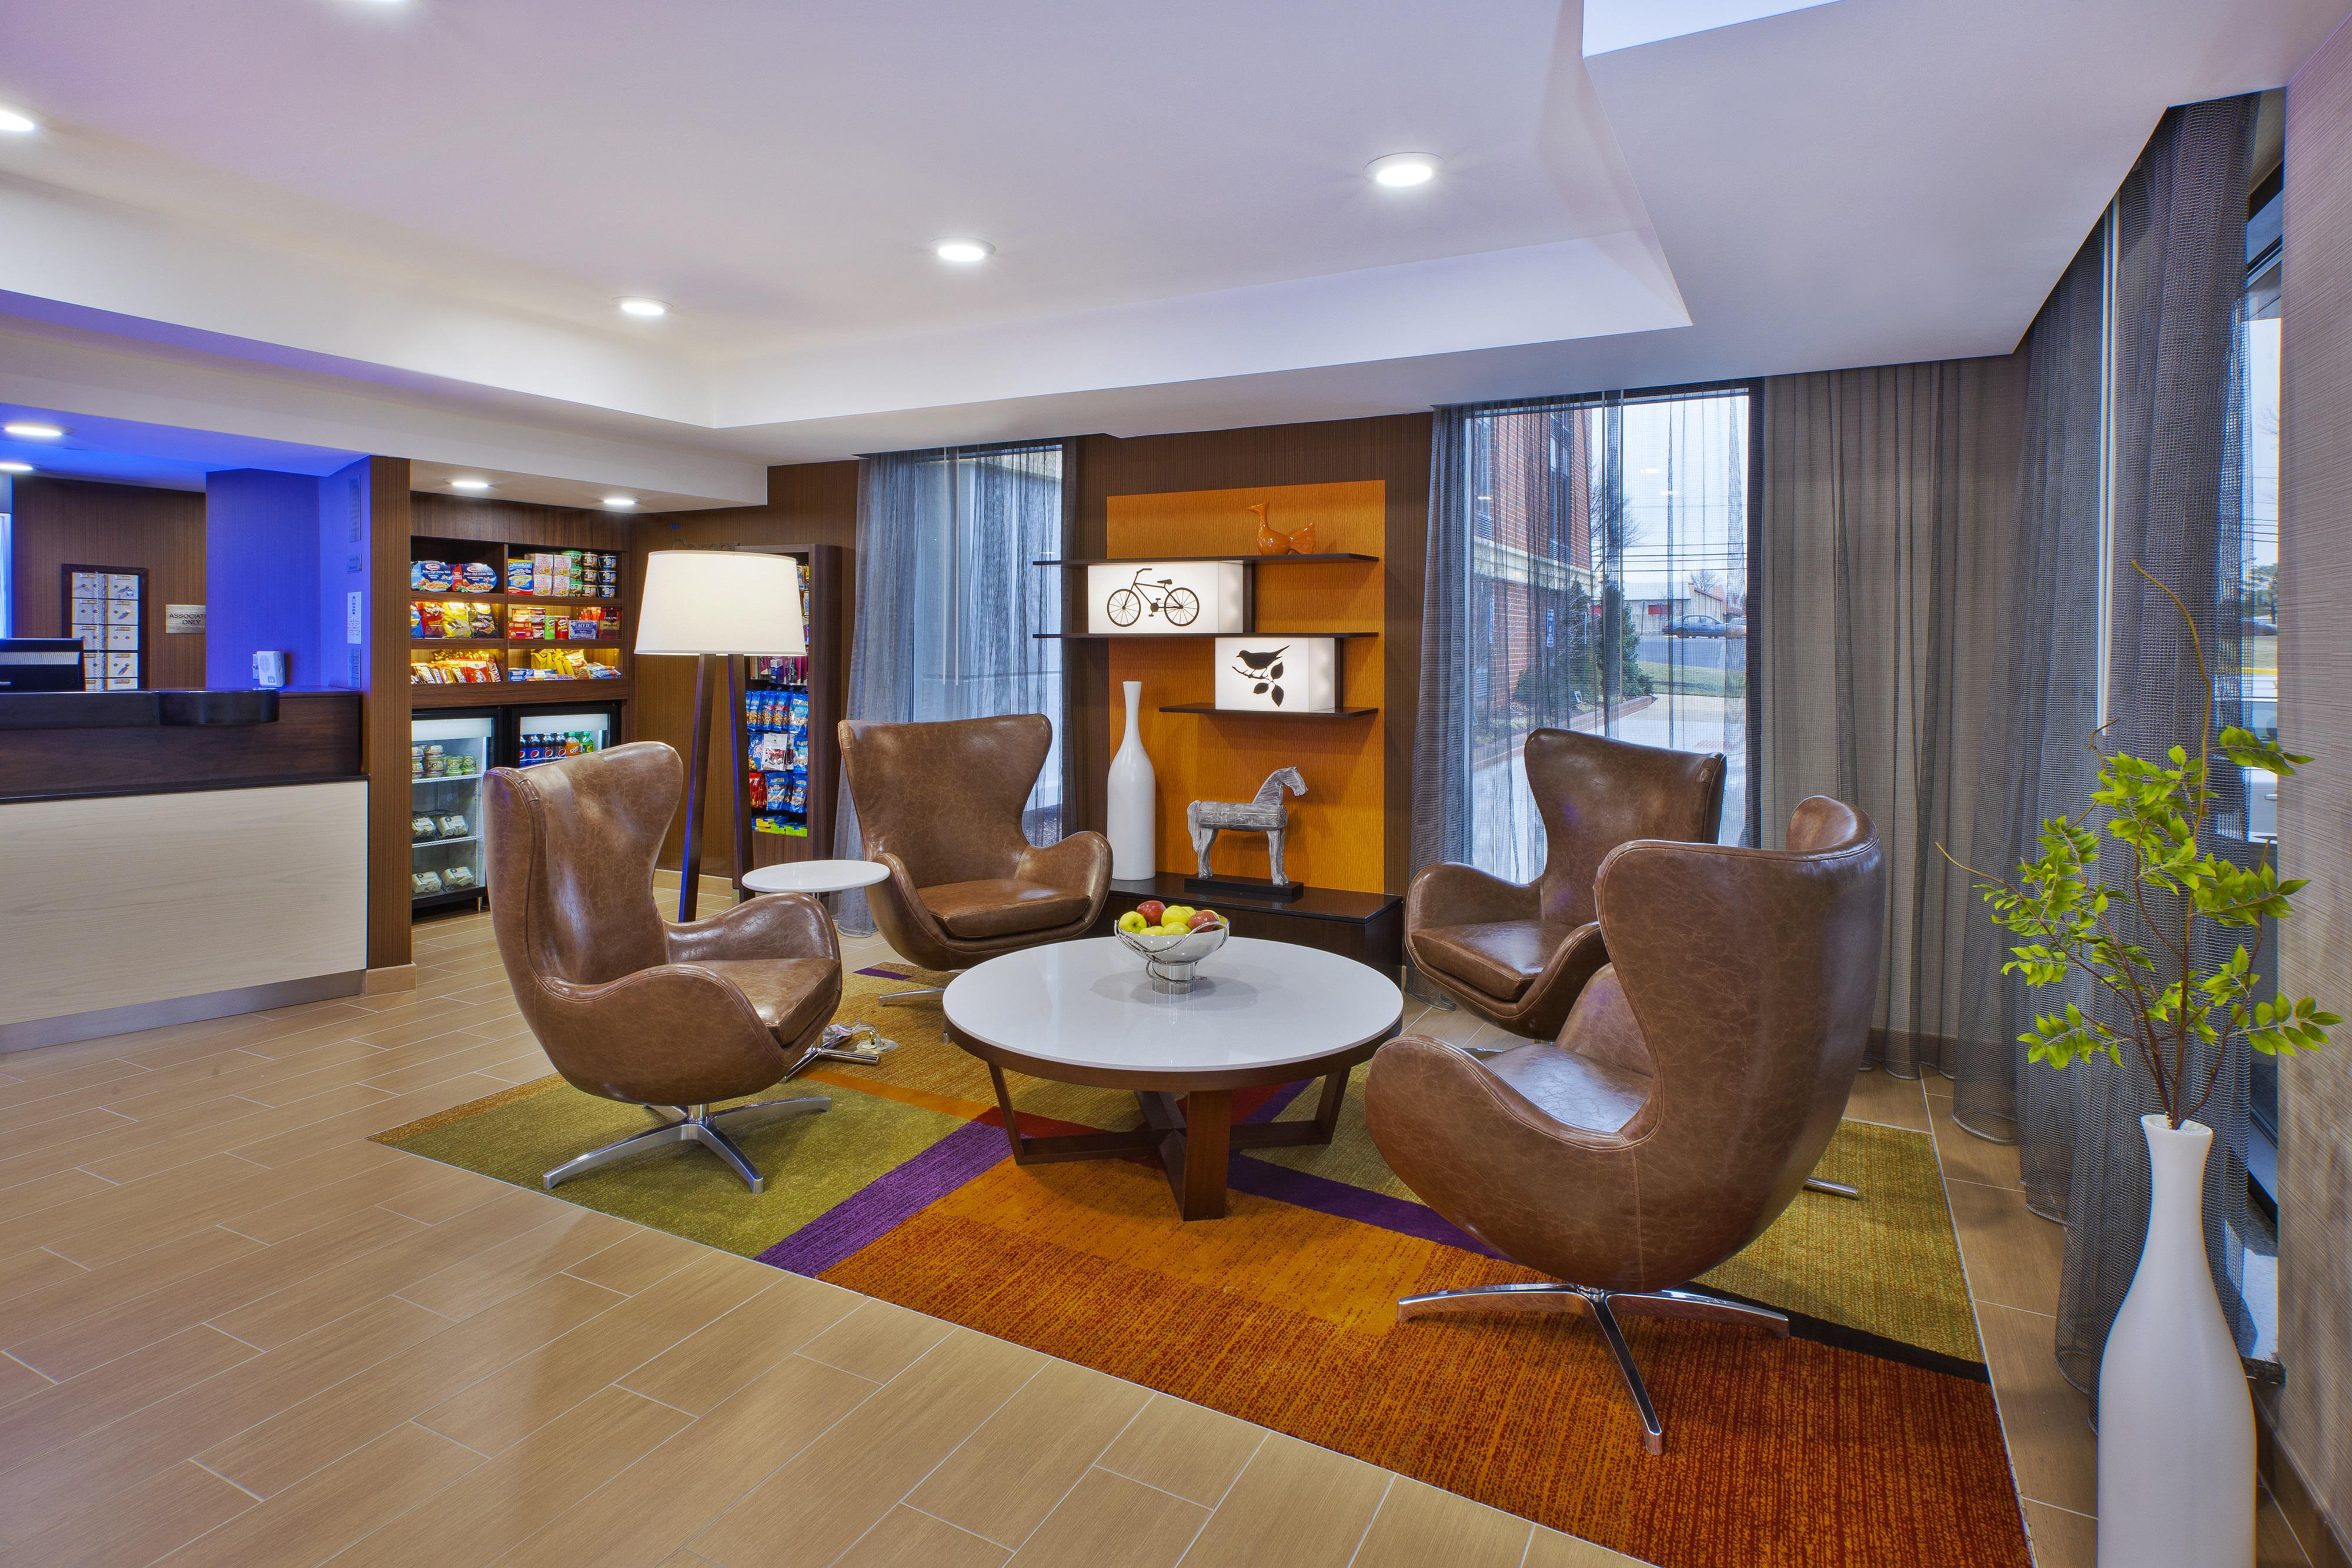 Fairfield Inn & Suites by Marriott Dulles Airport Herndon/Reston image 3